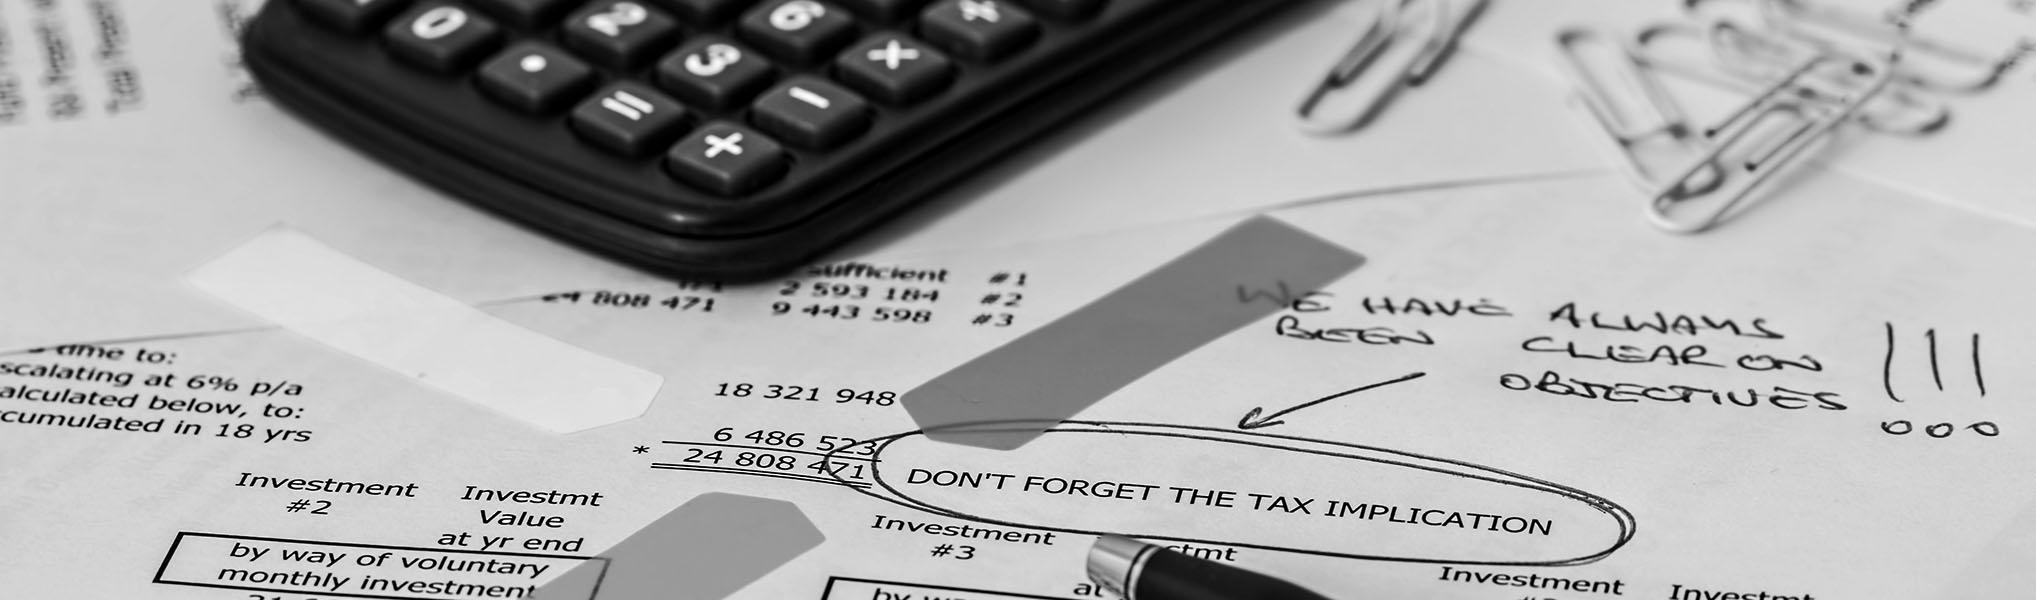 UK and US Tax returns